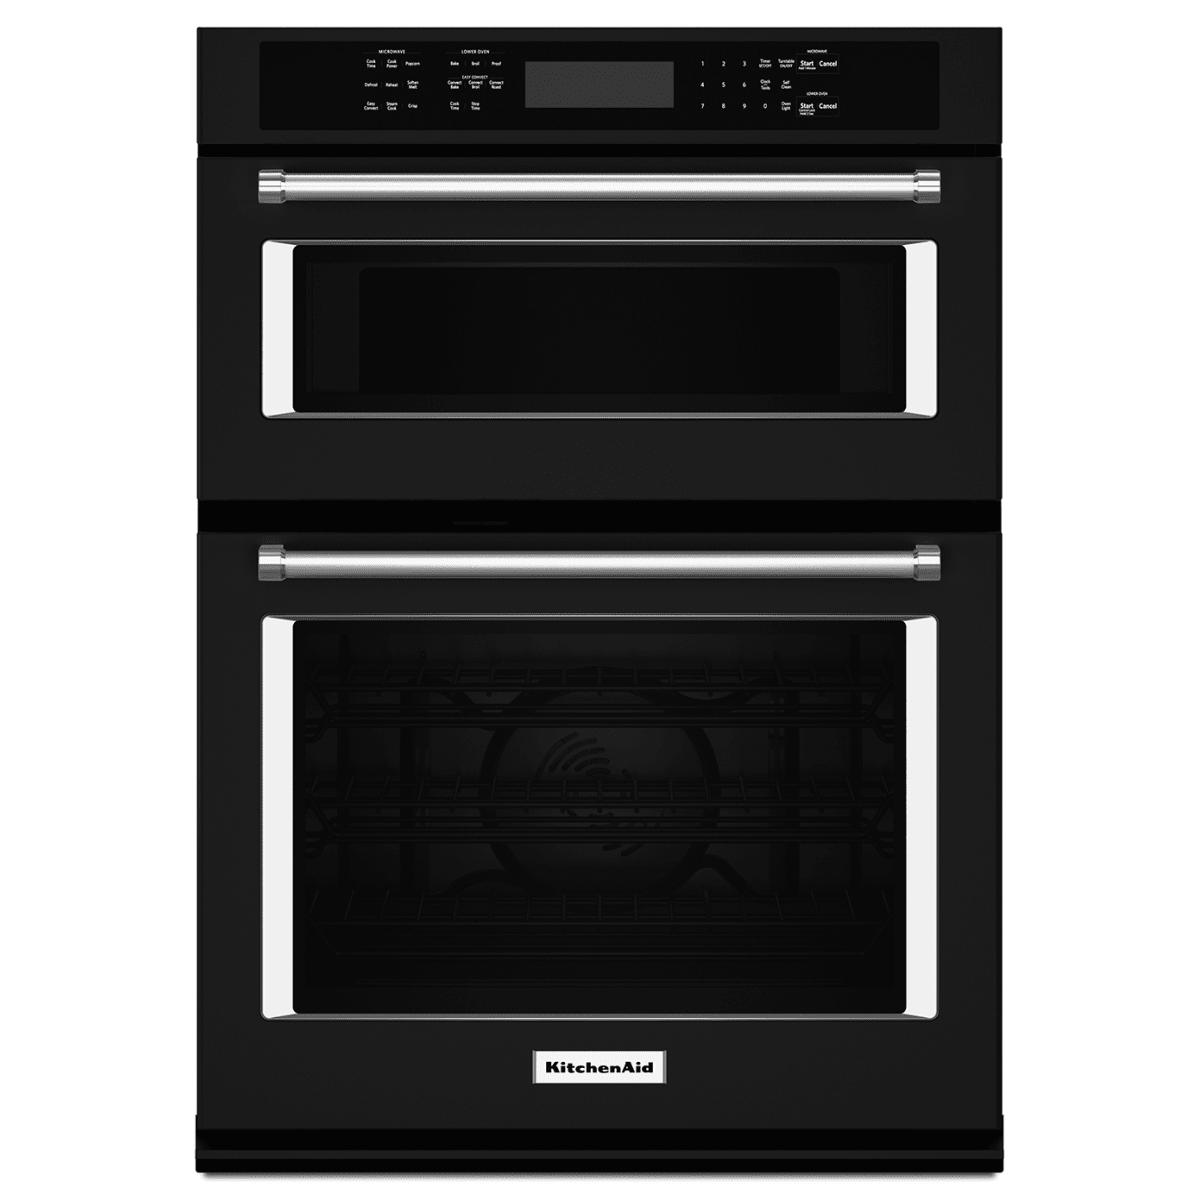 Kitchenaid Electric Ovens Koce500e